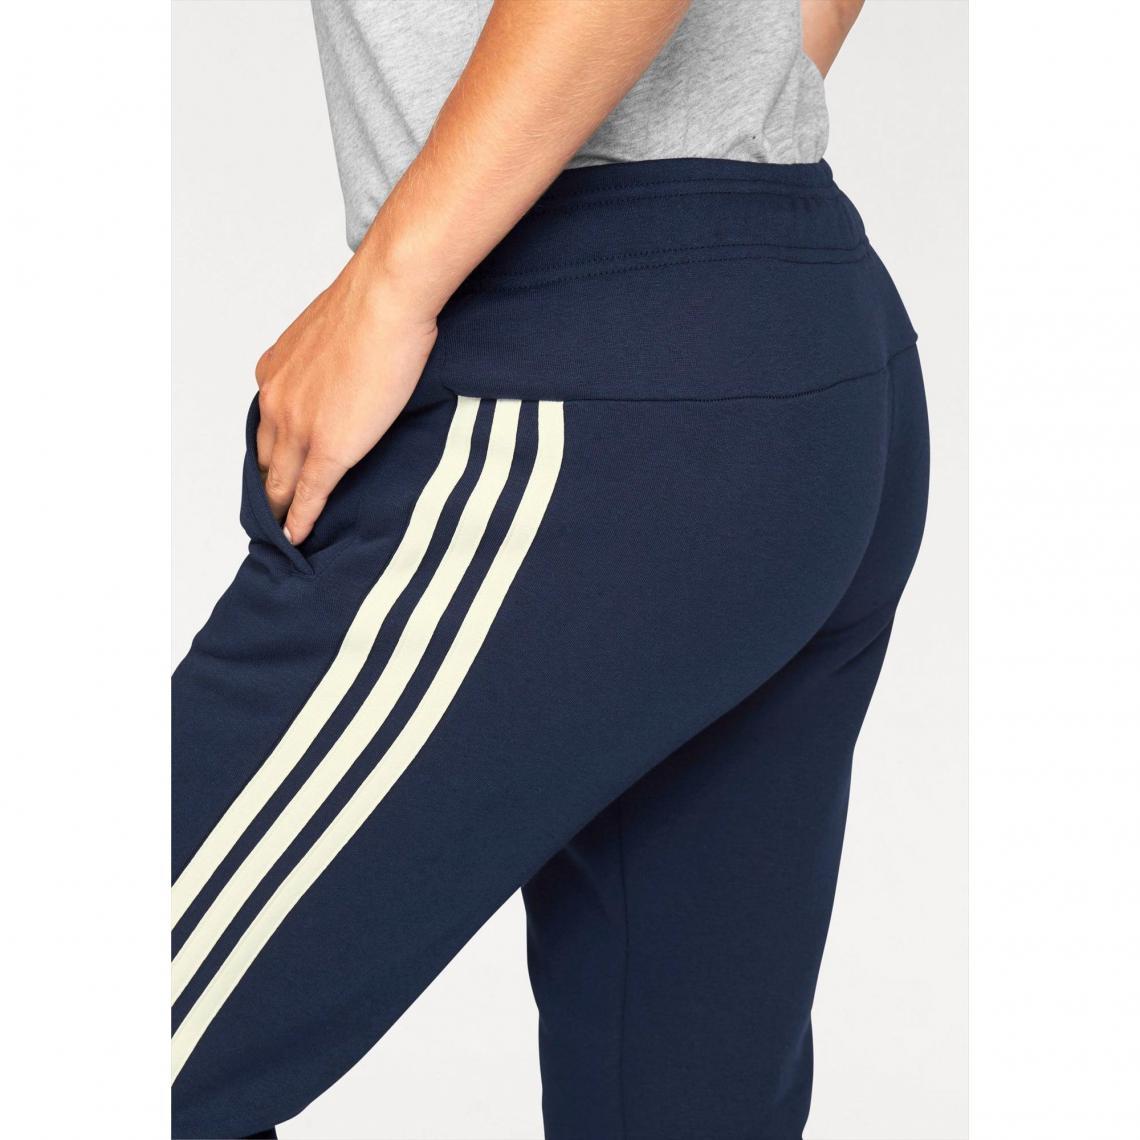 Jogging adidas Performance Essential 3S pant cuffed femme - Multicolore Adidas  Performance 3752147b79b